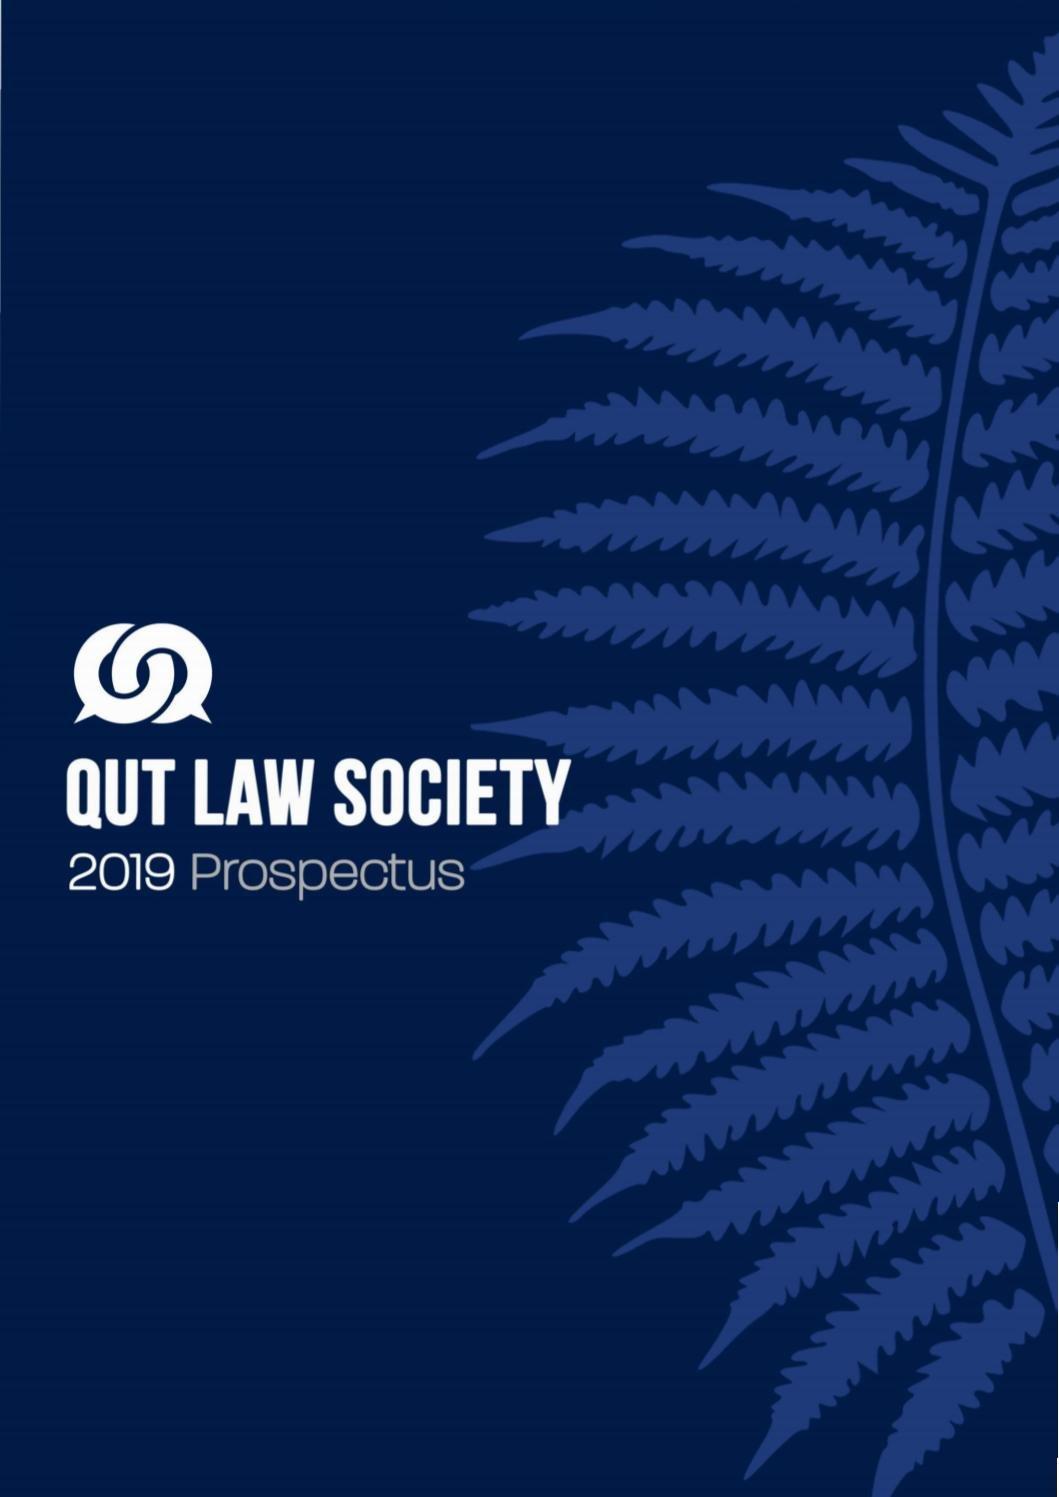 2019 Qut Law Society Sponsorship Prospectusqut Law Society – Issuu Calendar 2019 Qut